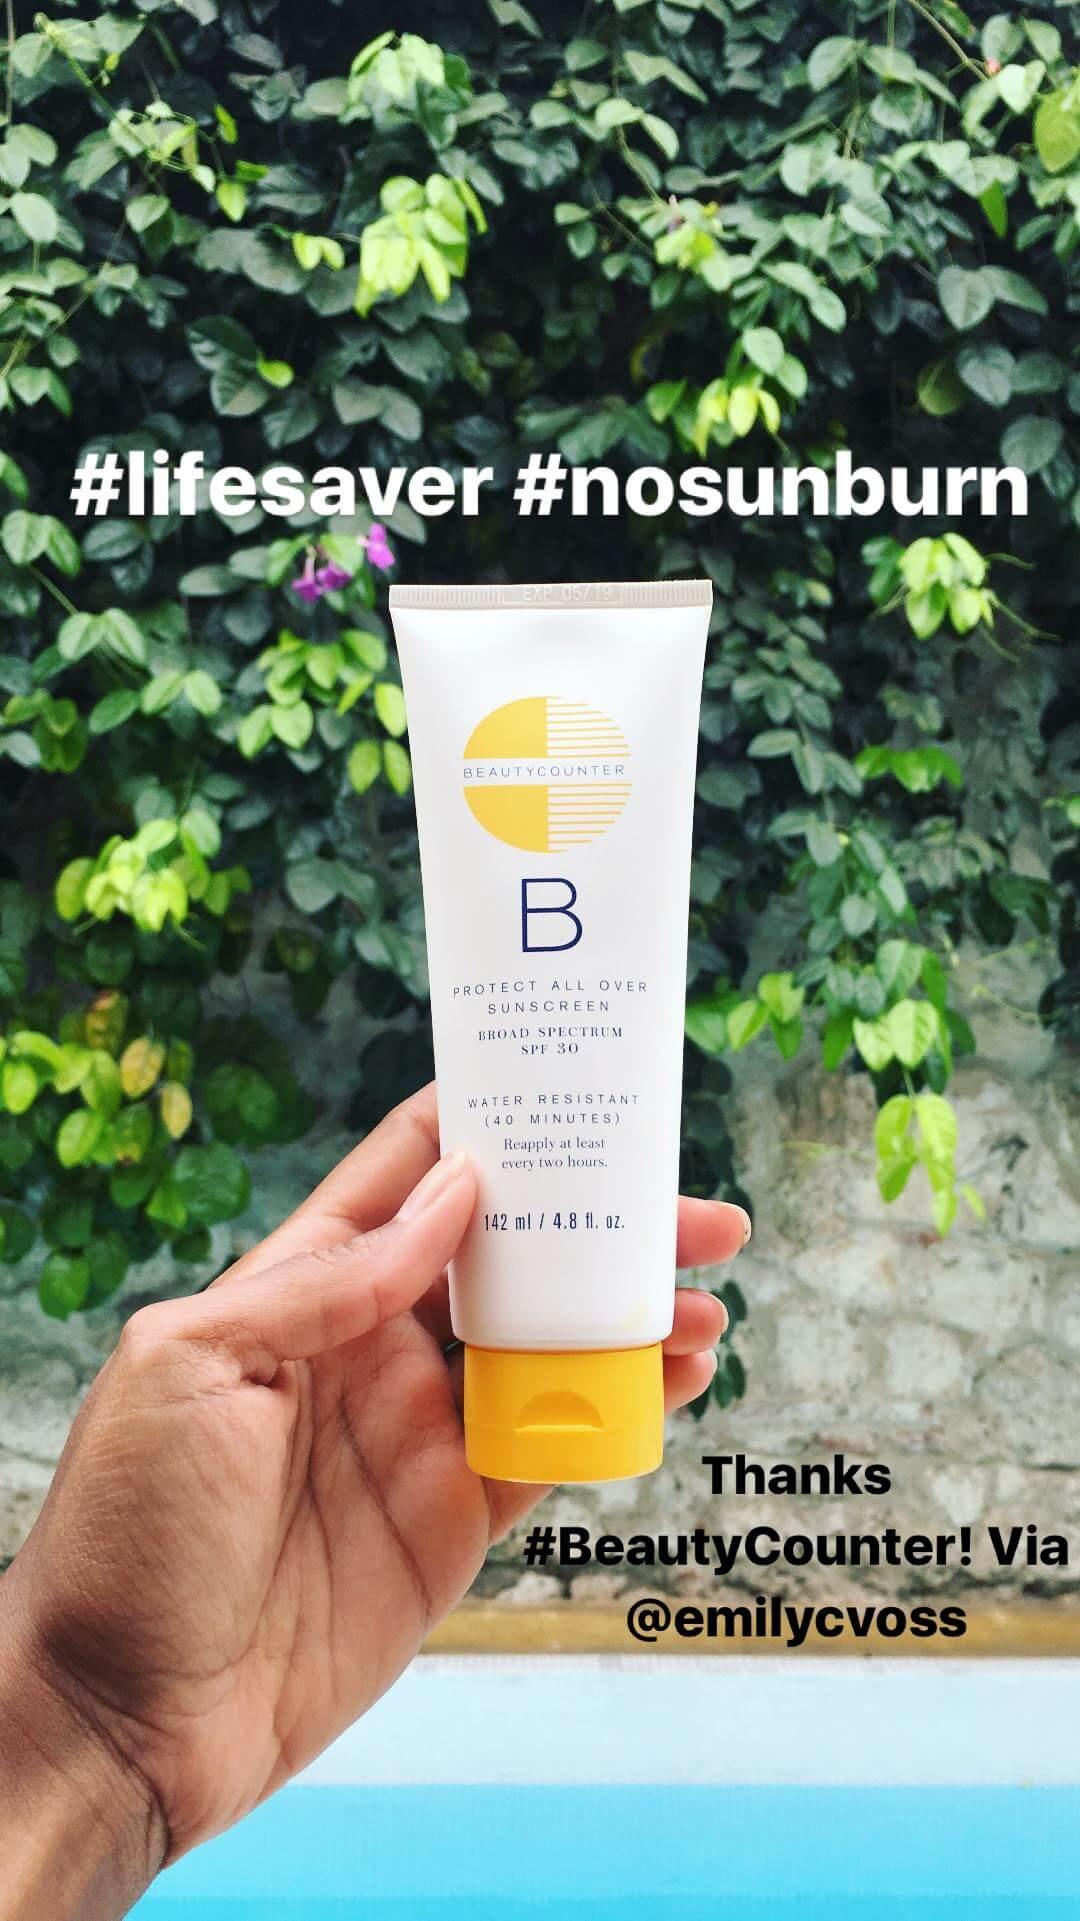 beautycounter-sunscreen-ochristine